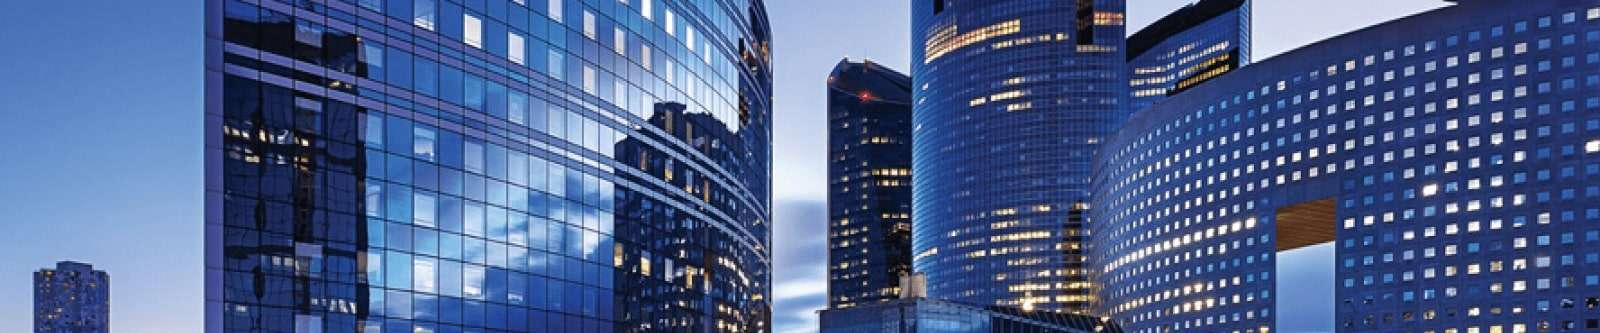 commercial building services